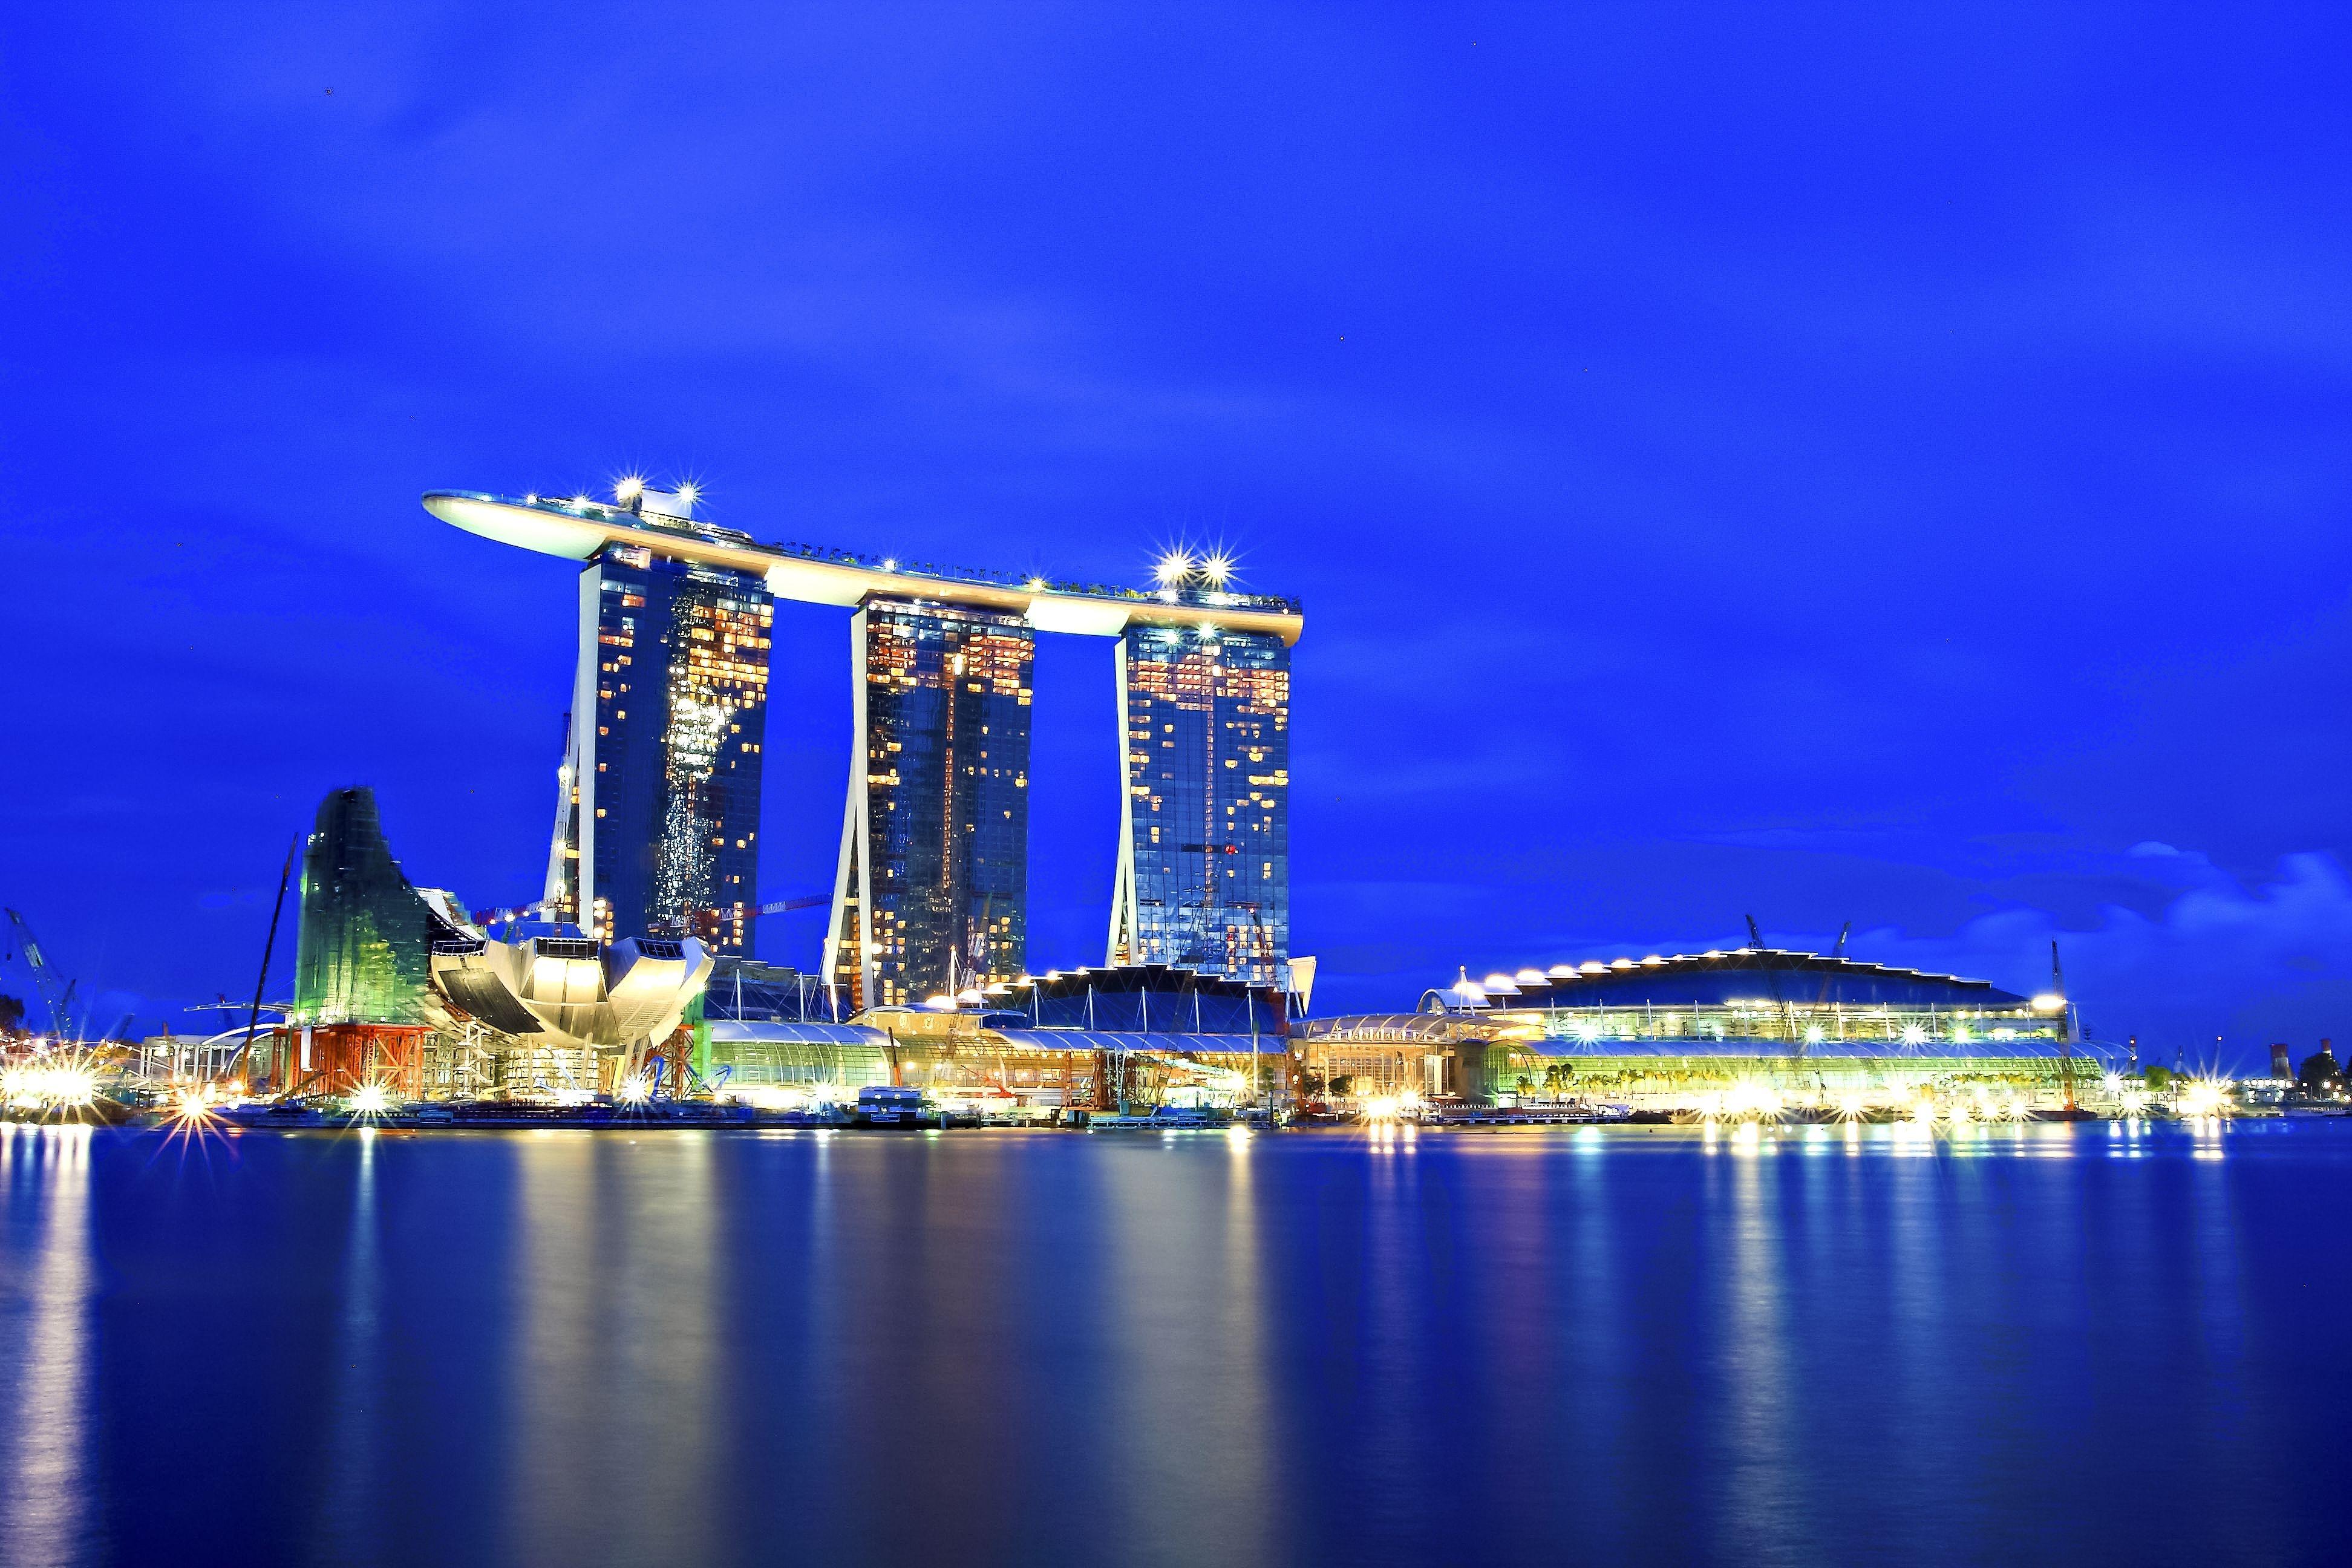 Singapore city night lights wallpaper | 3888x2592 | 220453 ...